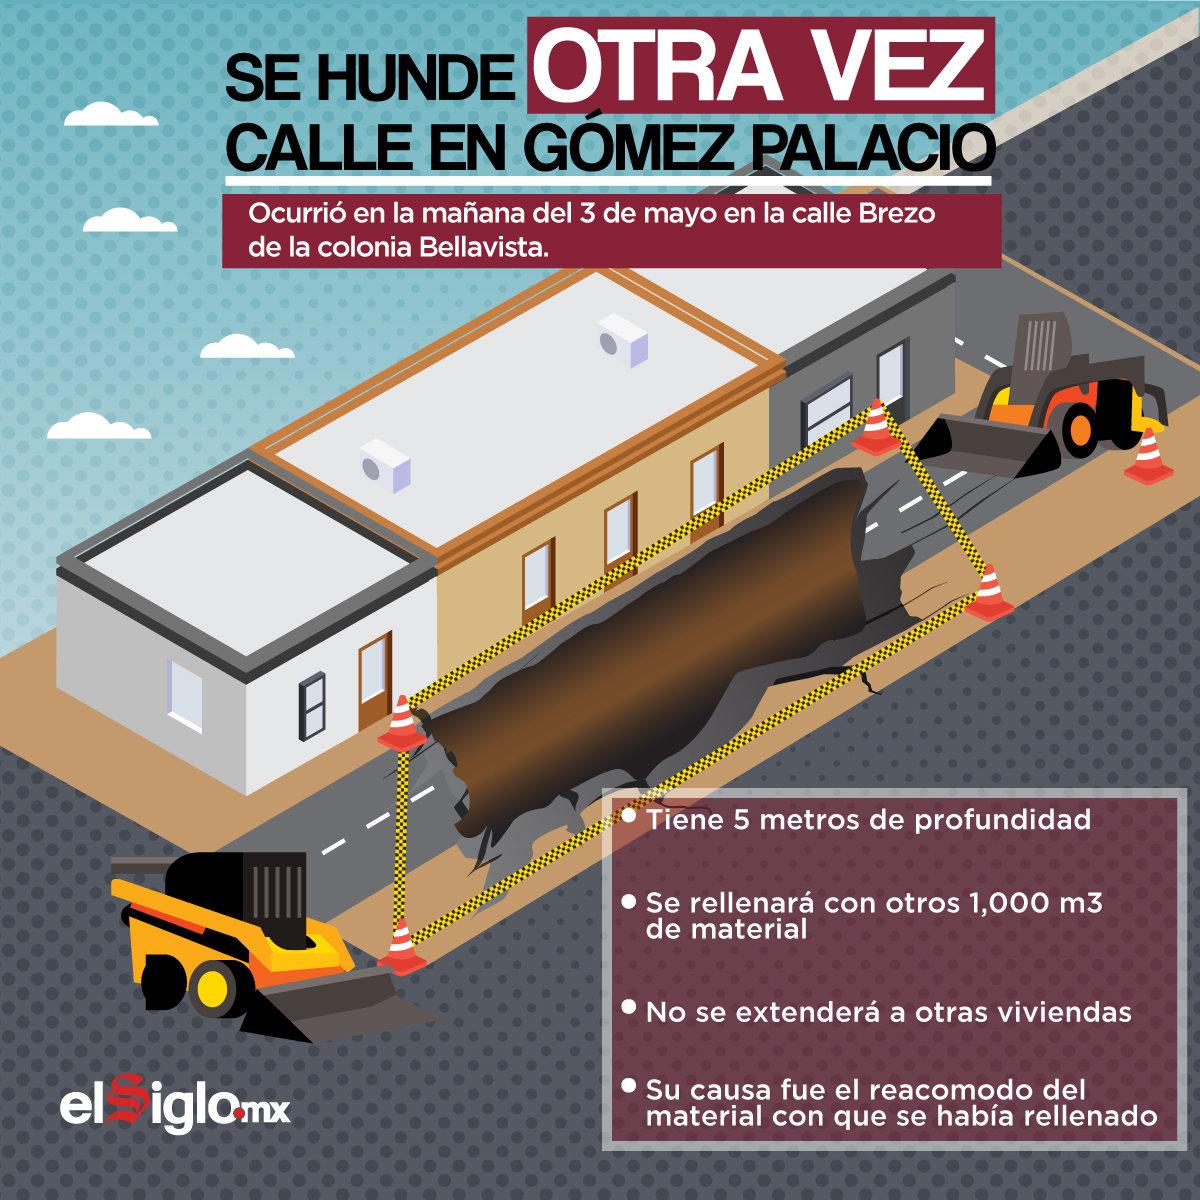 'Se hunde otra vez calle en Gómez Palacio'